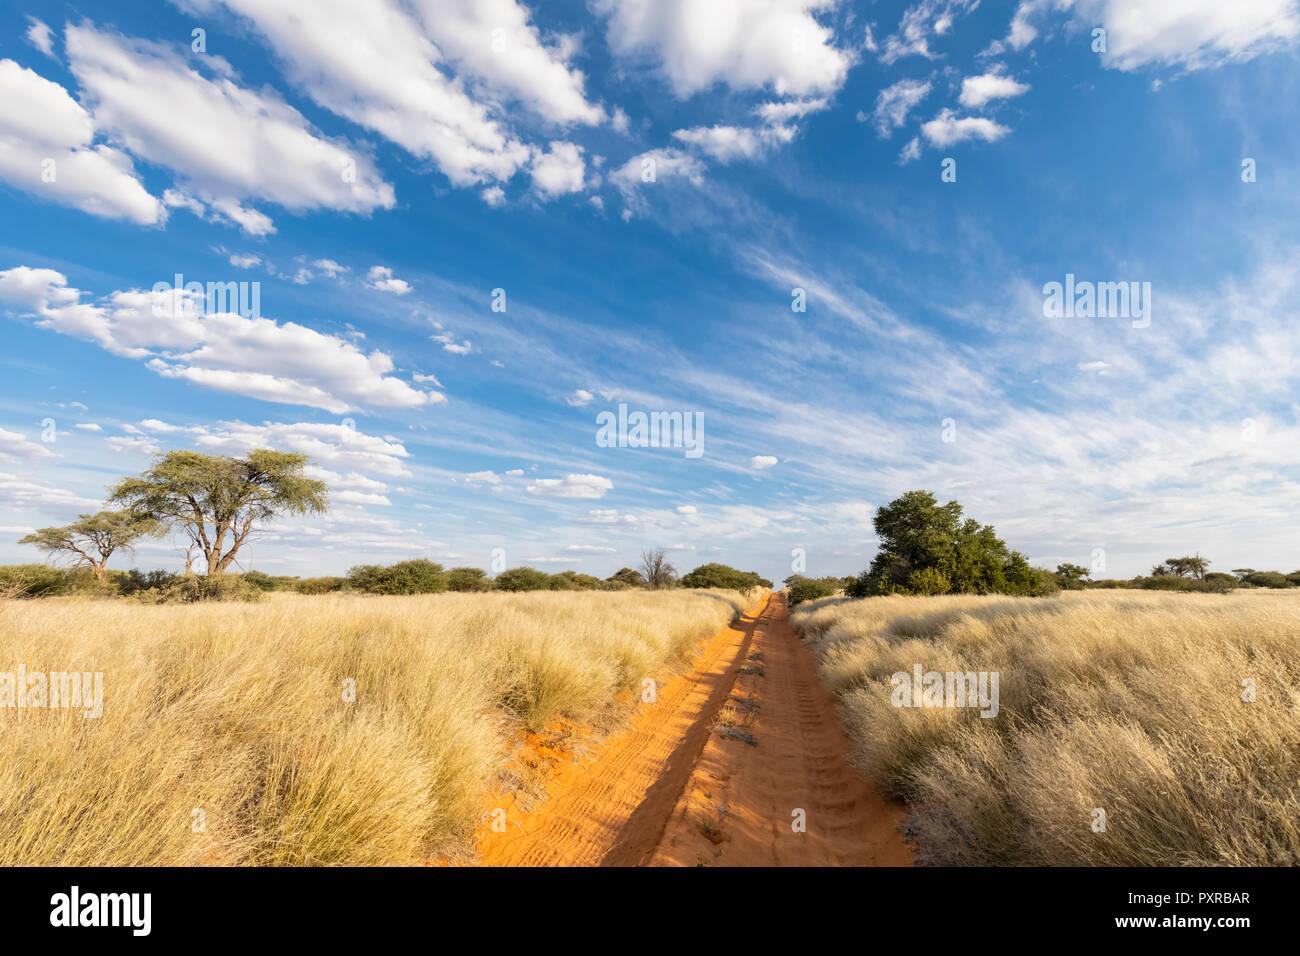 Africa, Botswana, Kgalagadi Transfrontier Park, Mabuasehube Game Reserve, empty sand track - Stock Image